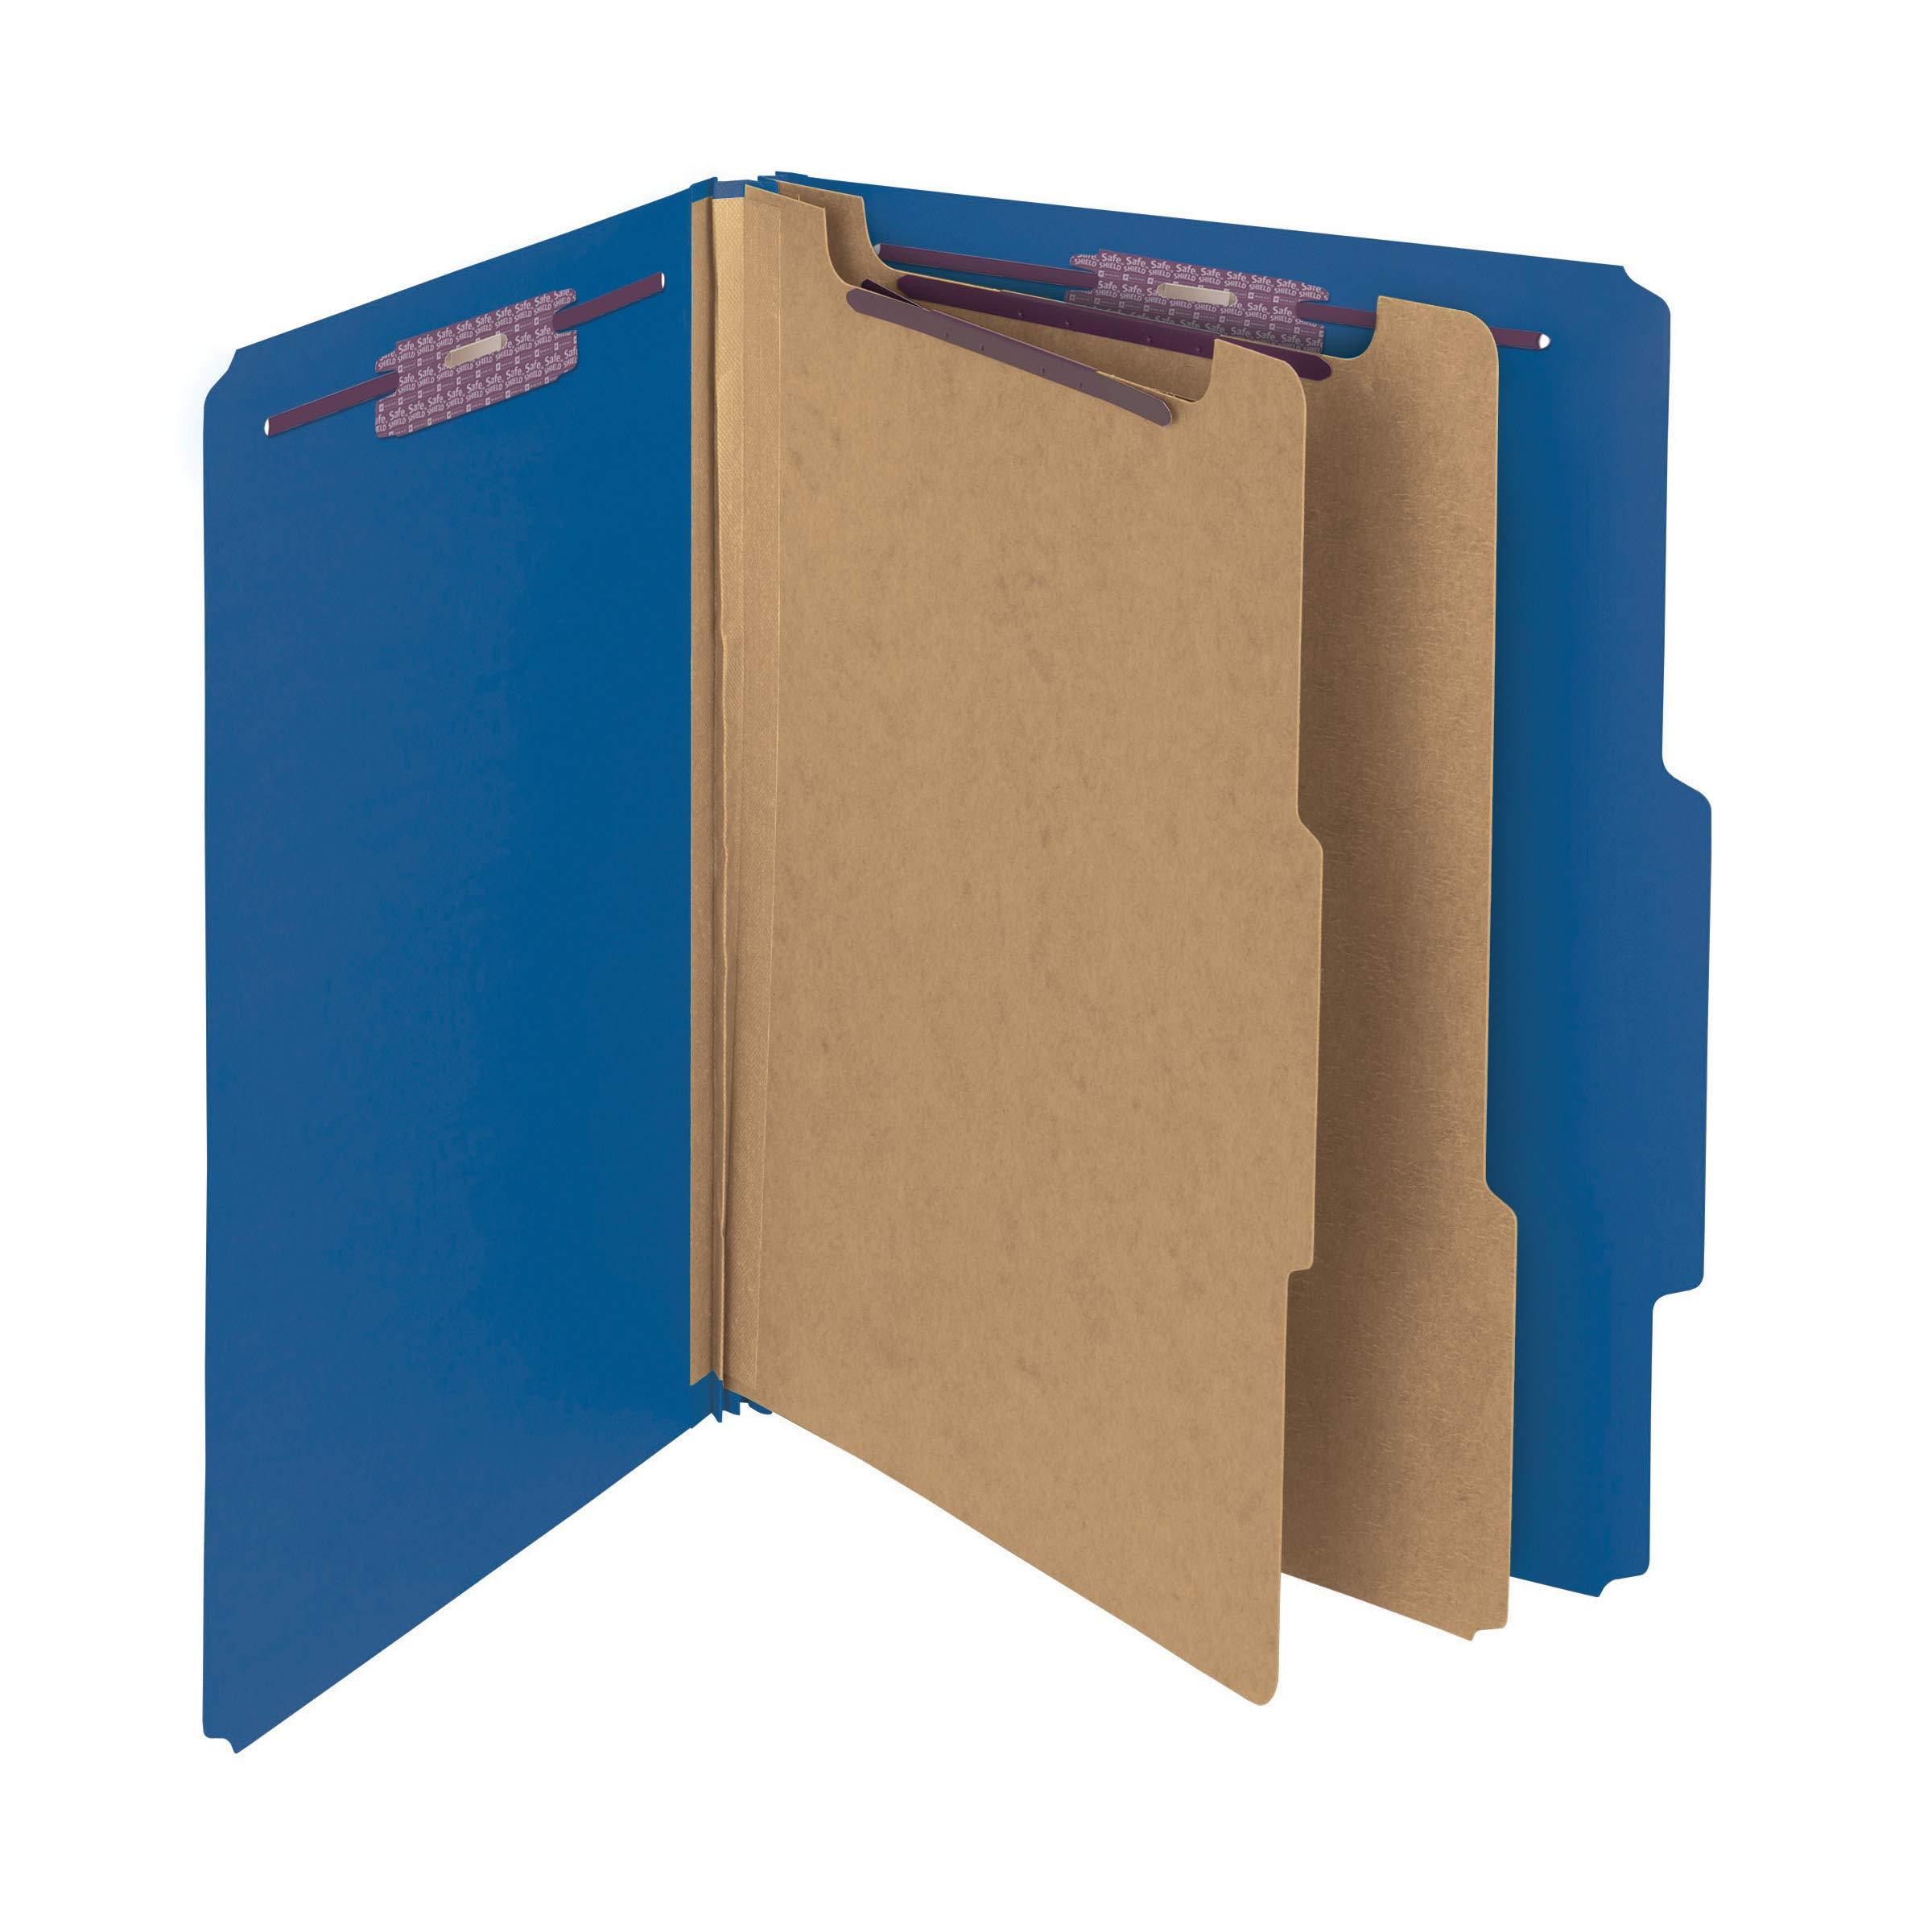 Smead Pressboard Classification File Folder with SafeSHIELD Fasteners, 2 Dividers, 2'' Expansion, Letter Size, Dark Blue, 10 per Box (14032)